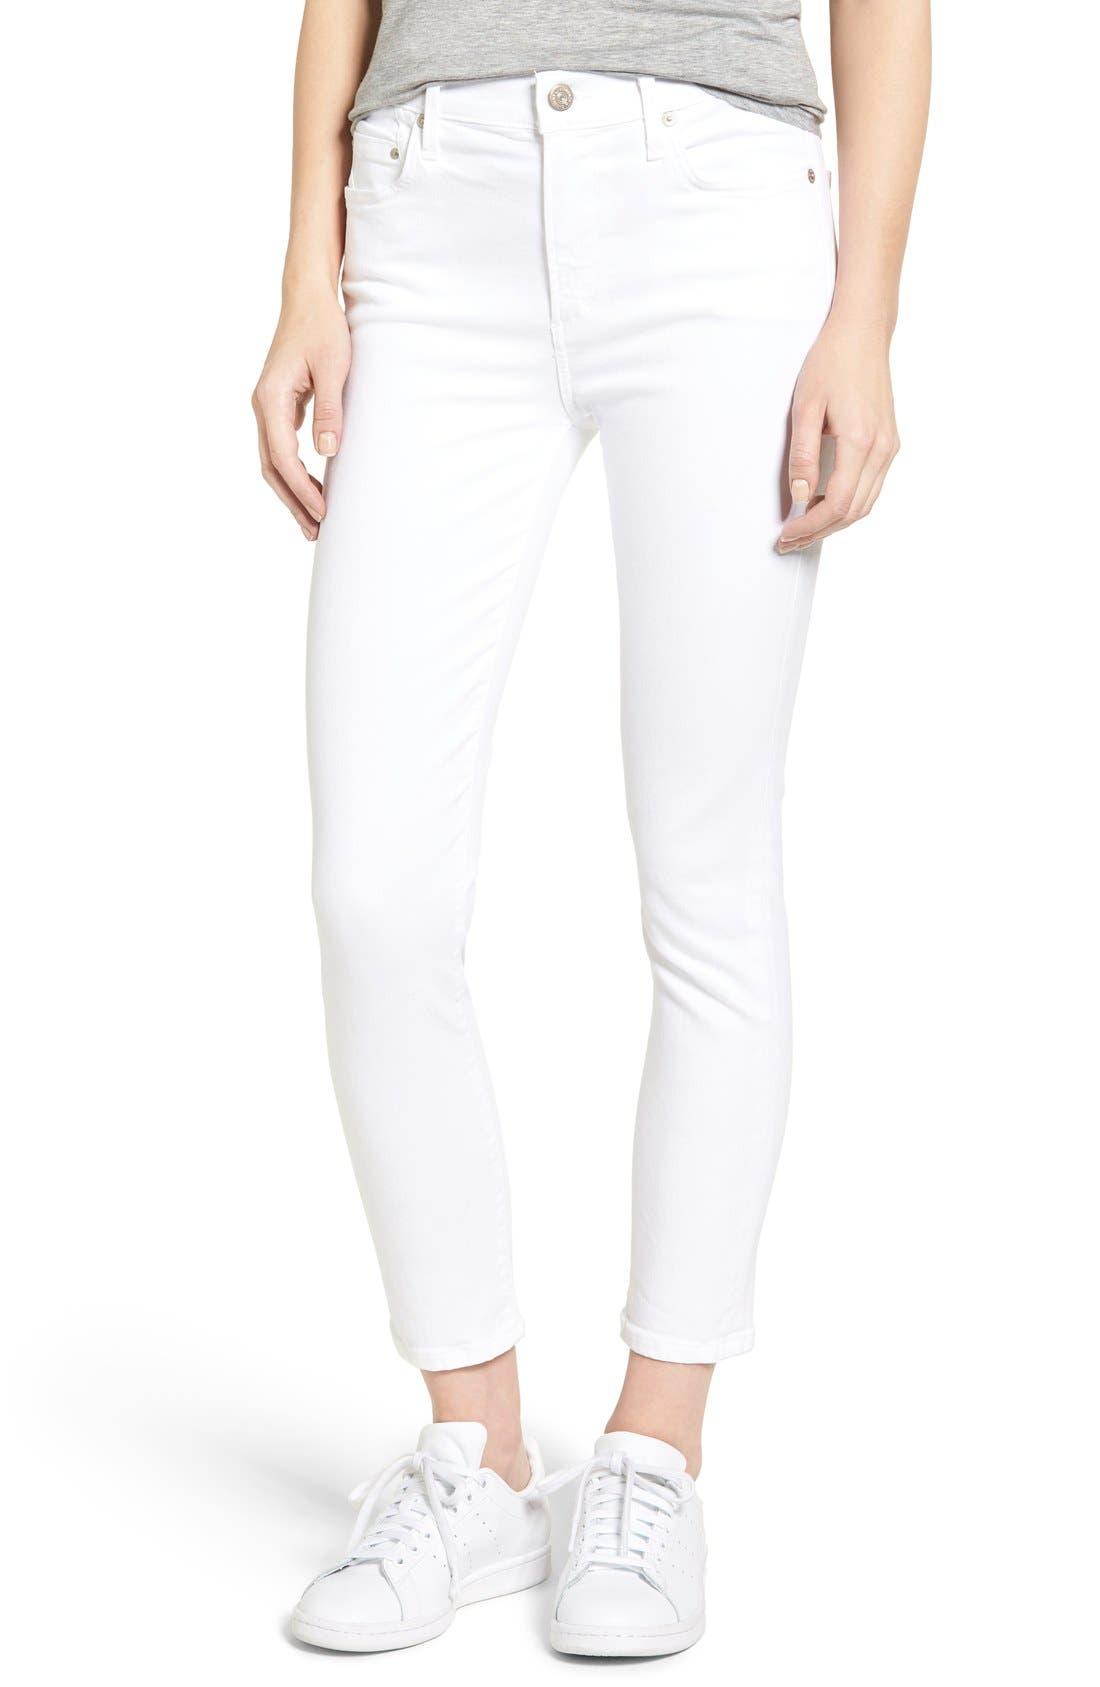 Rocket High Waist Crop Skinny Jeans,                             Alternate thumbnail 6, color,                             SCULPT WHITE